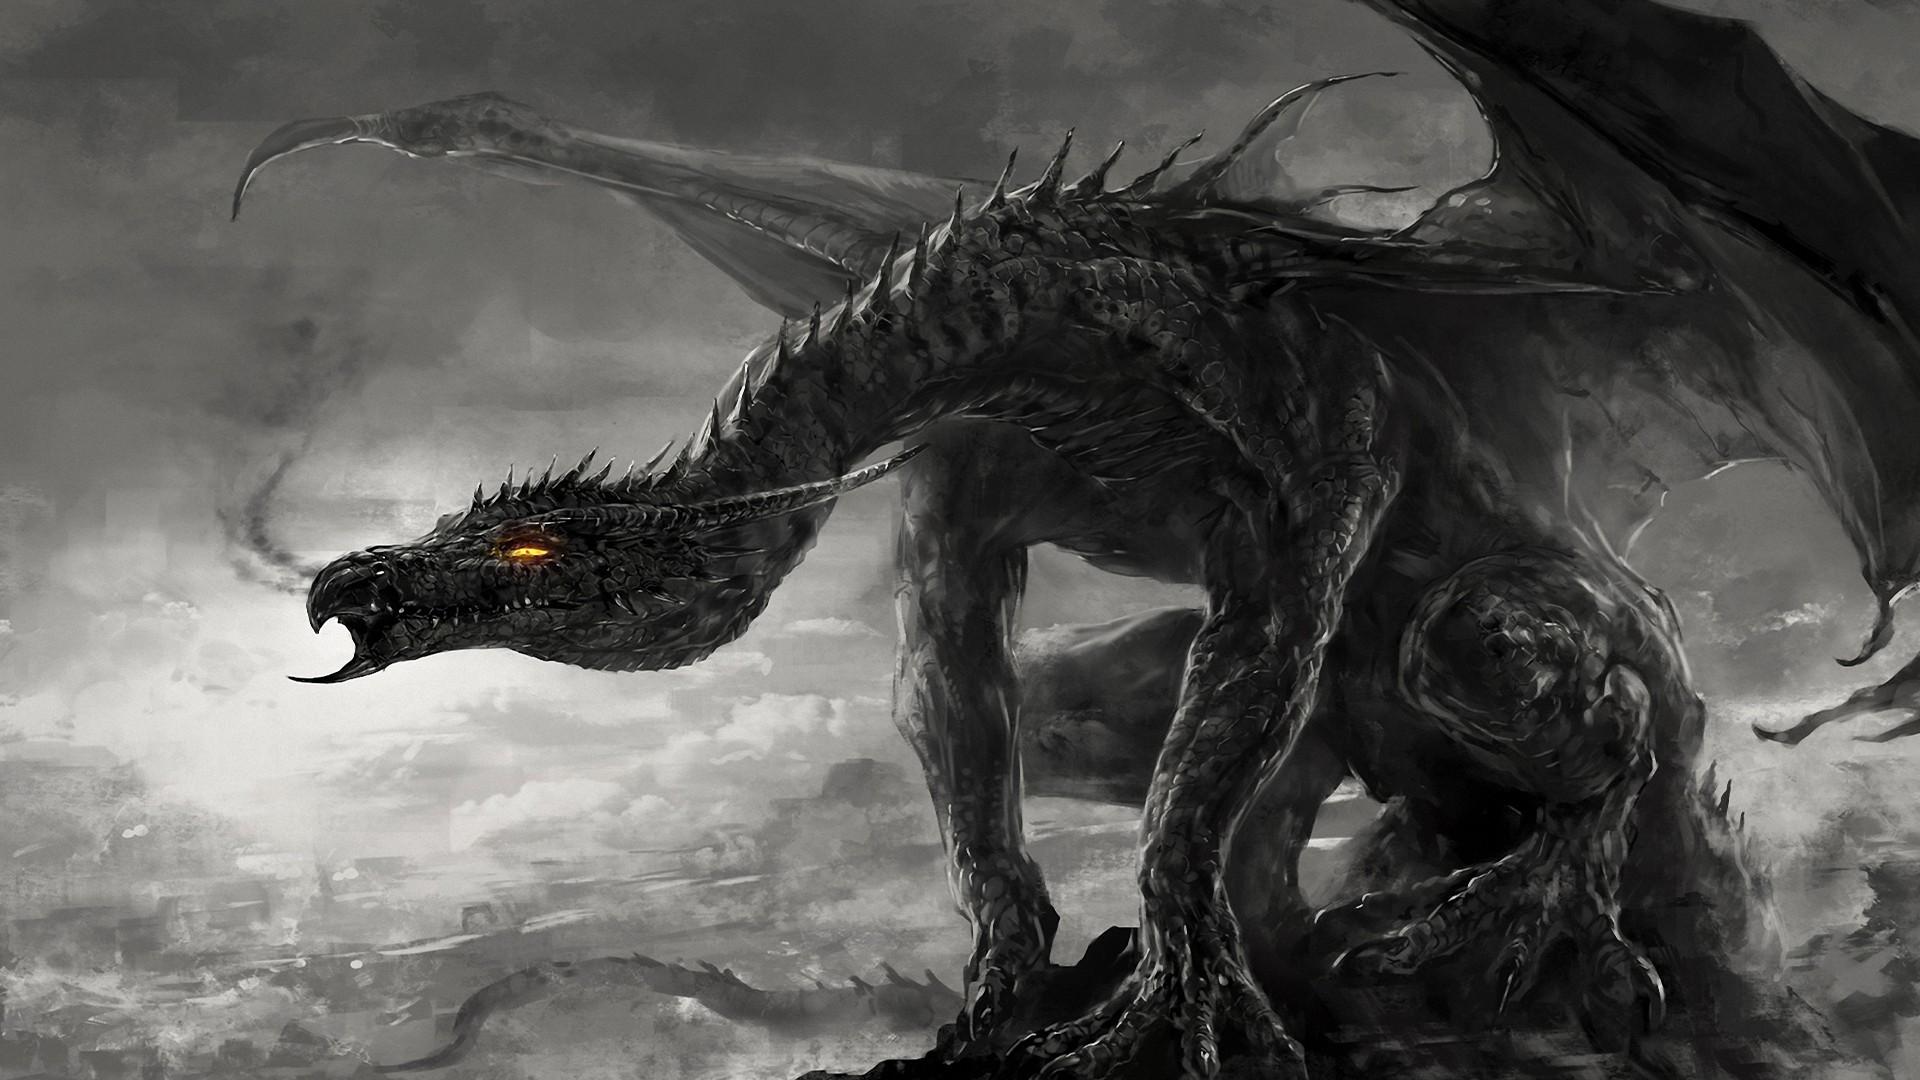 artwork, Dragon, Fire, Black, Dark